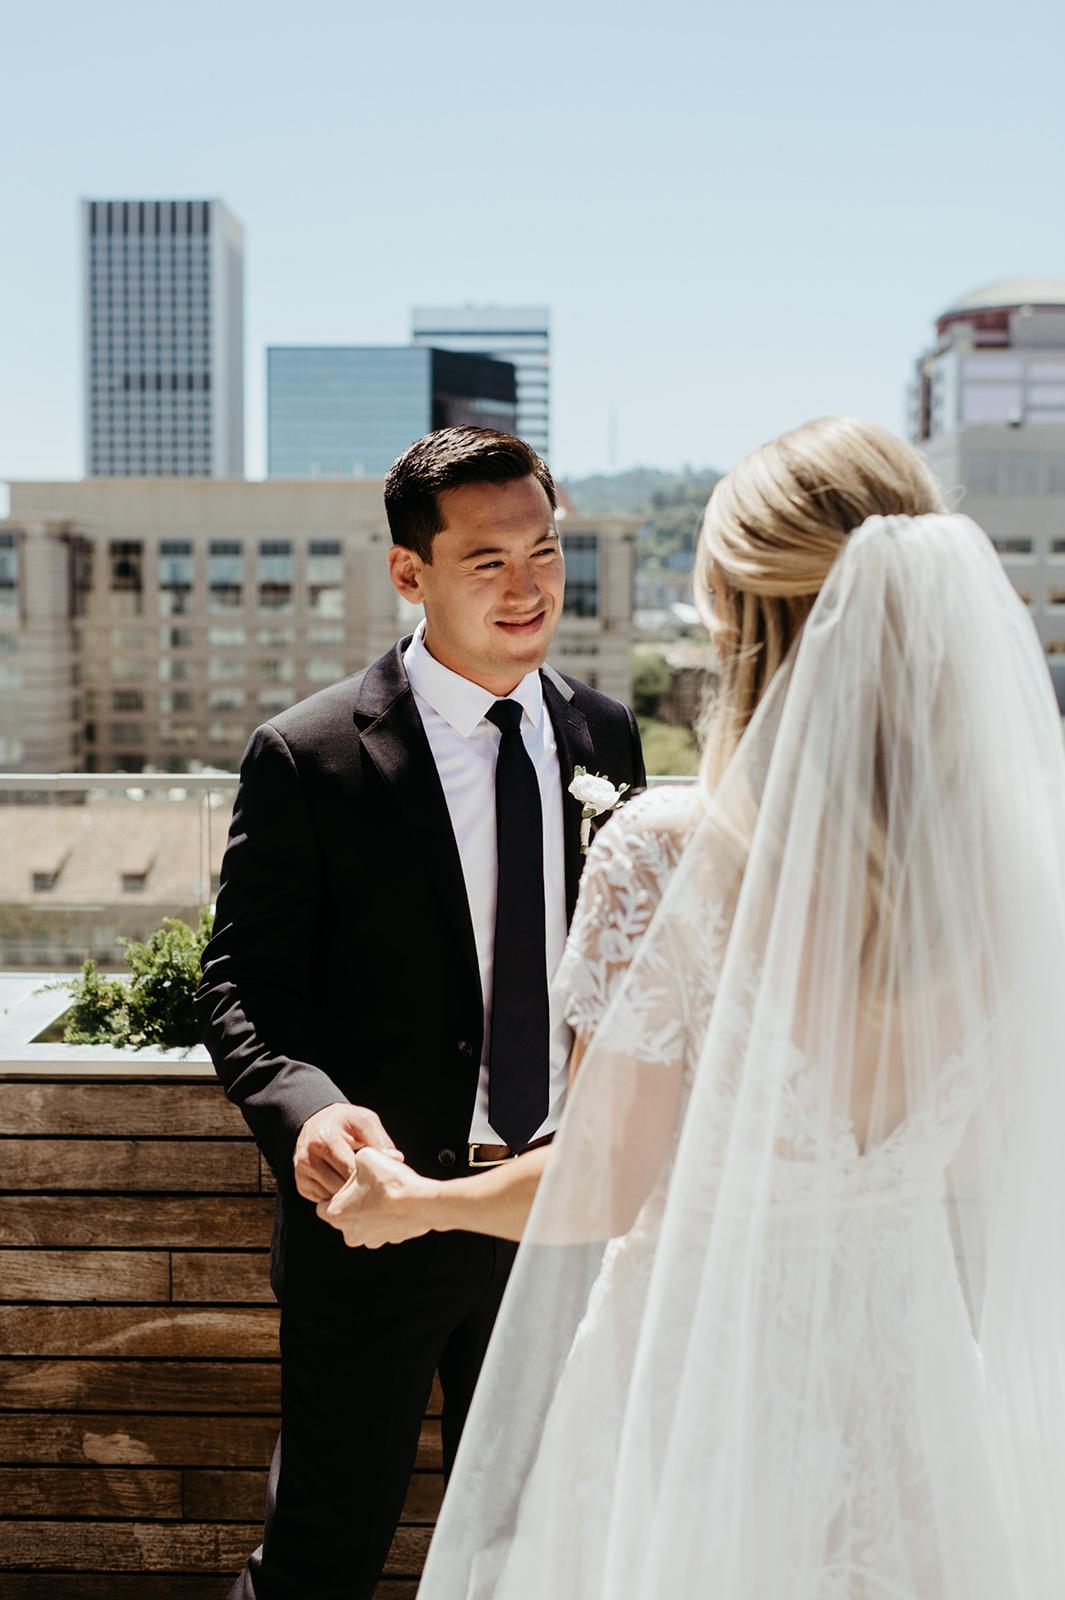 Bridalbliss.com   Portland Wedding   Oregon Event Planning and Design   Laurken Kendall Photography